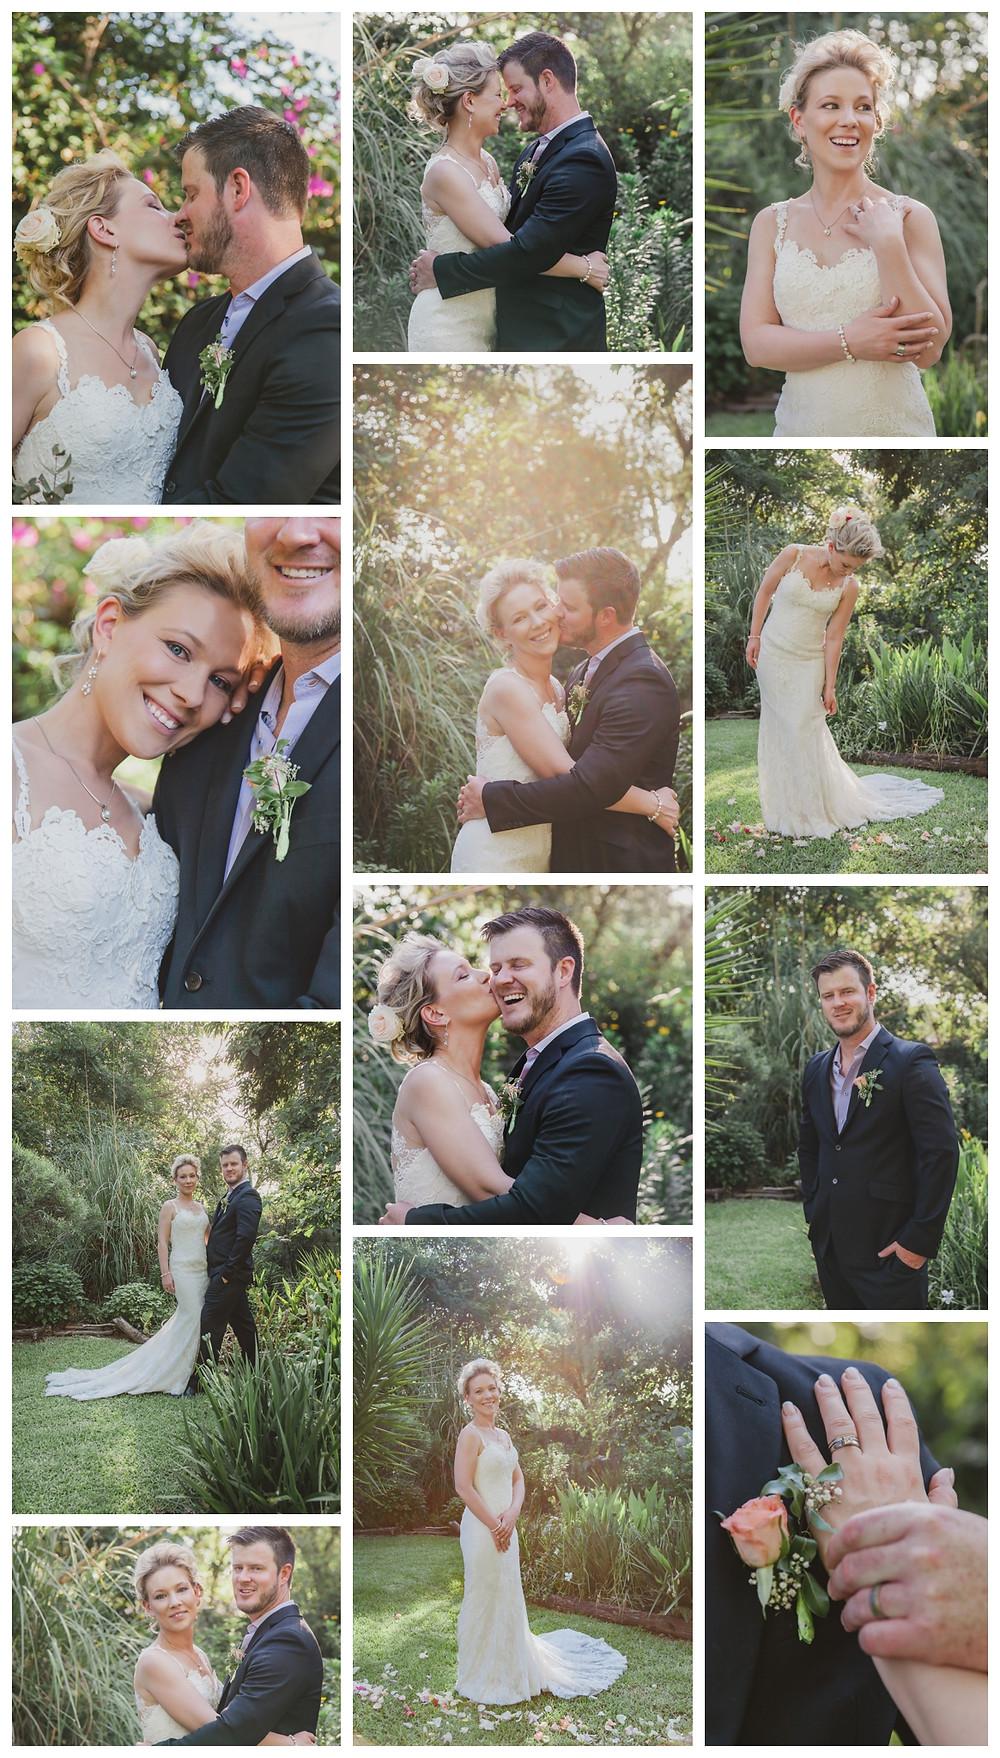 Craig and Nadine's garden wedding ceremony - couple shoot